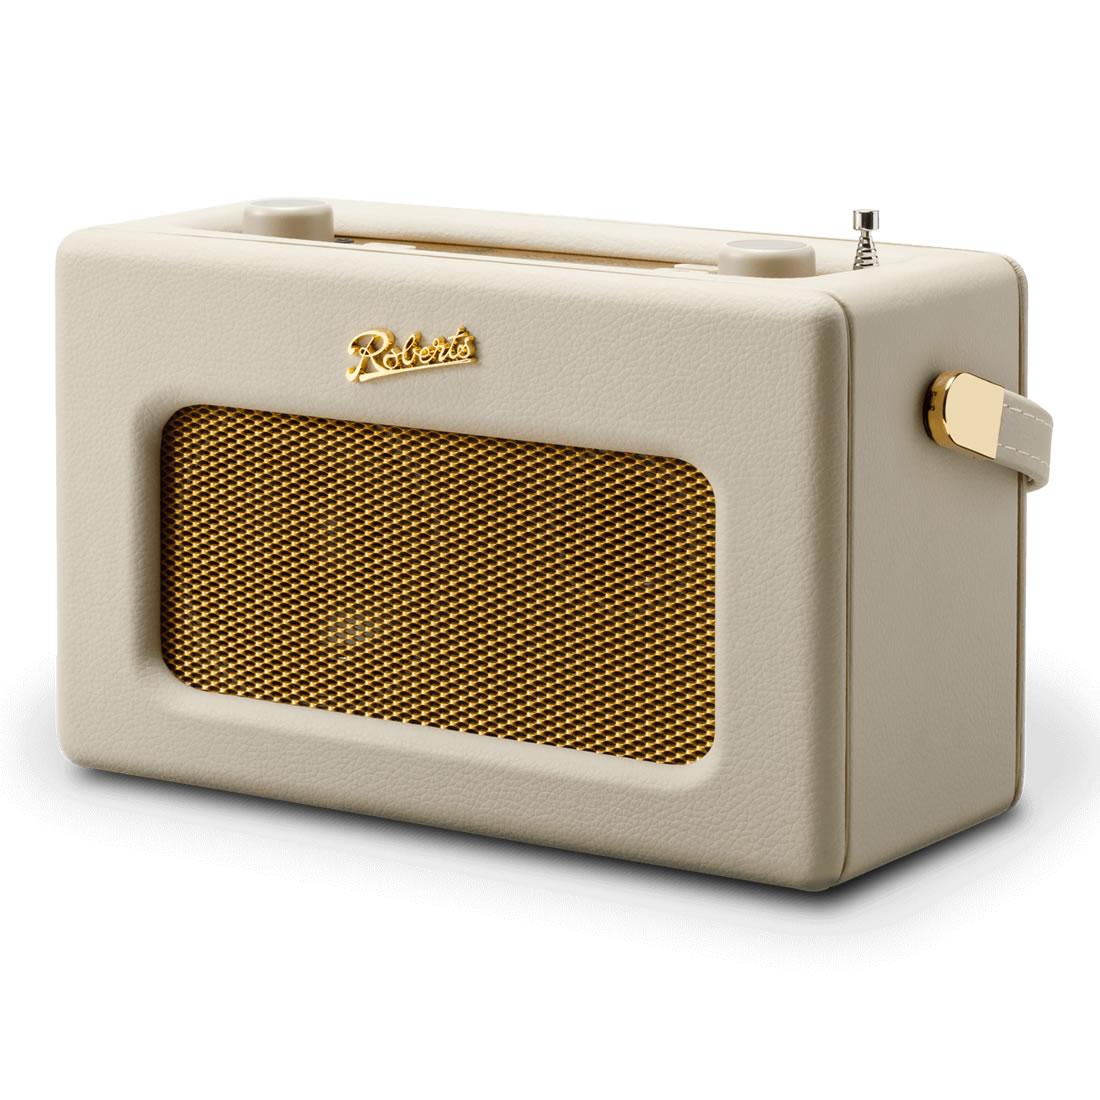 DAB/DAB+/FM RDS & WiFi Internet Radio Pastel Cream